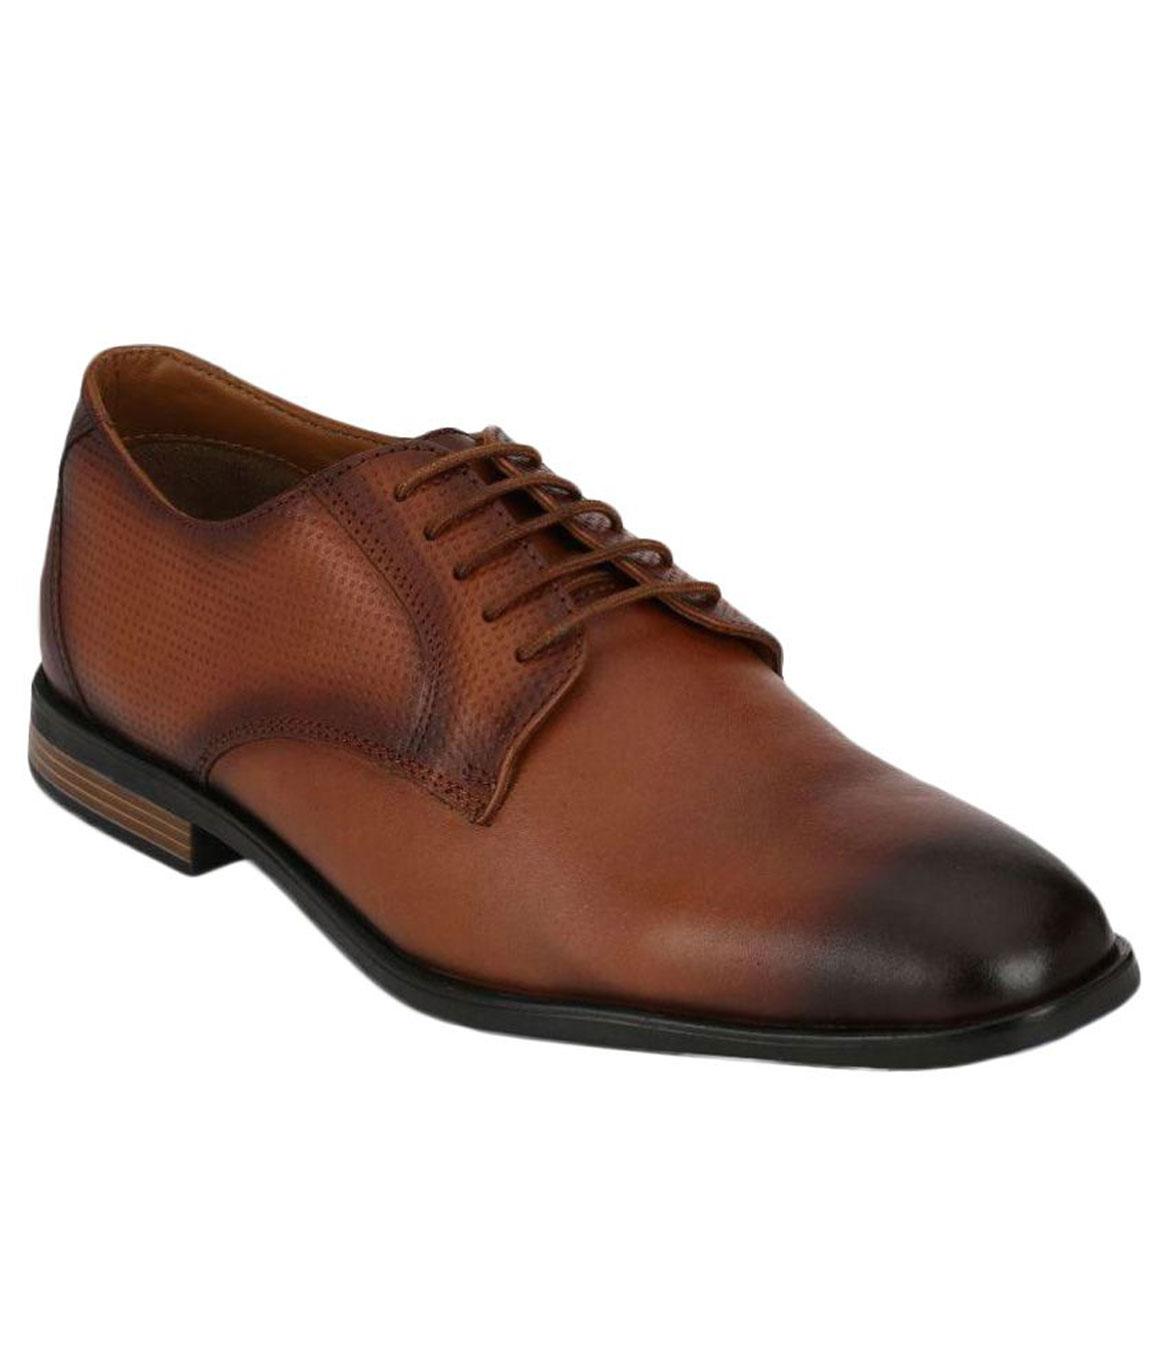 Boggy Confort Tan Formal Shoes